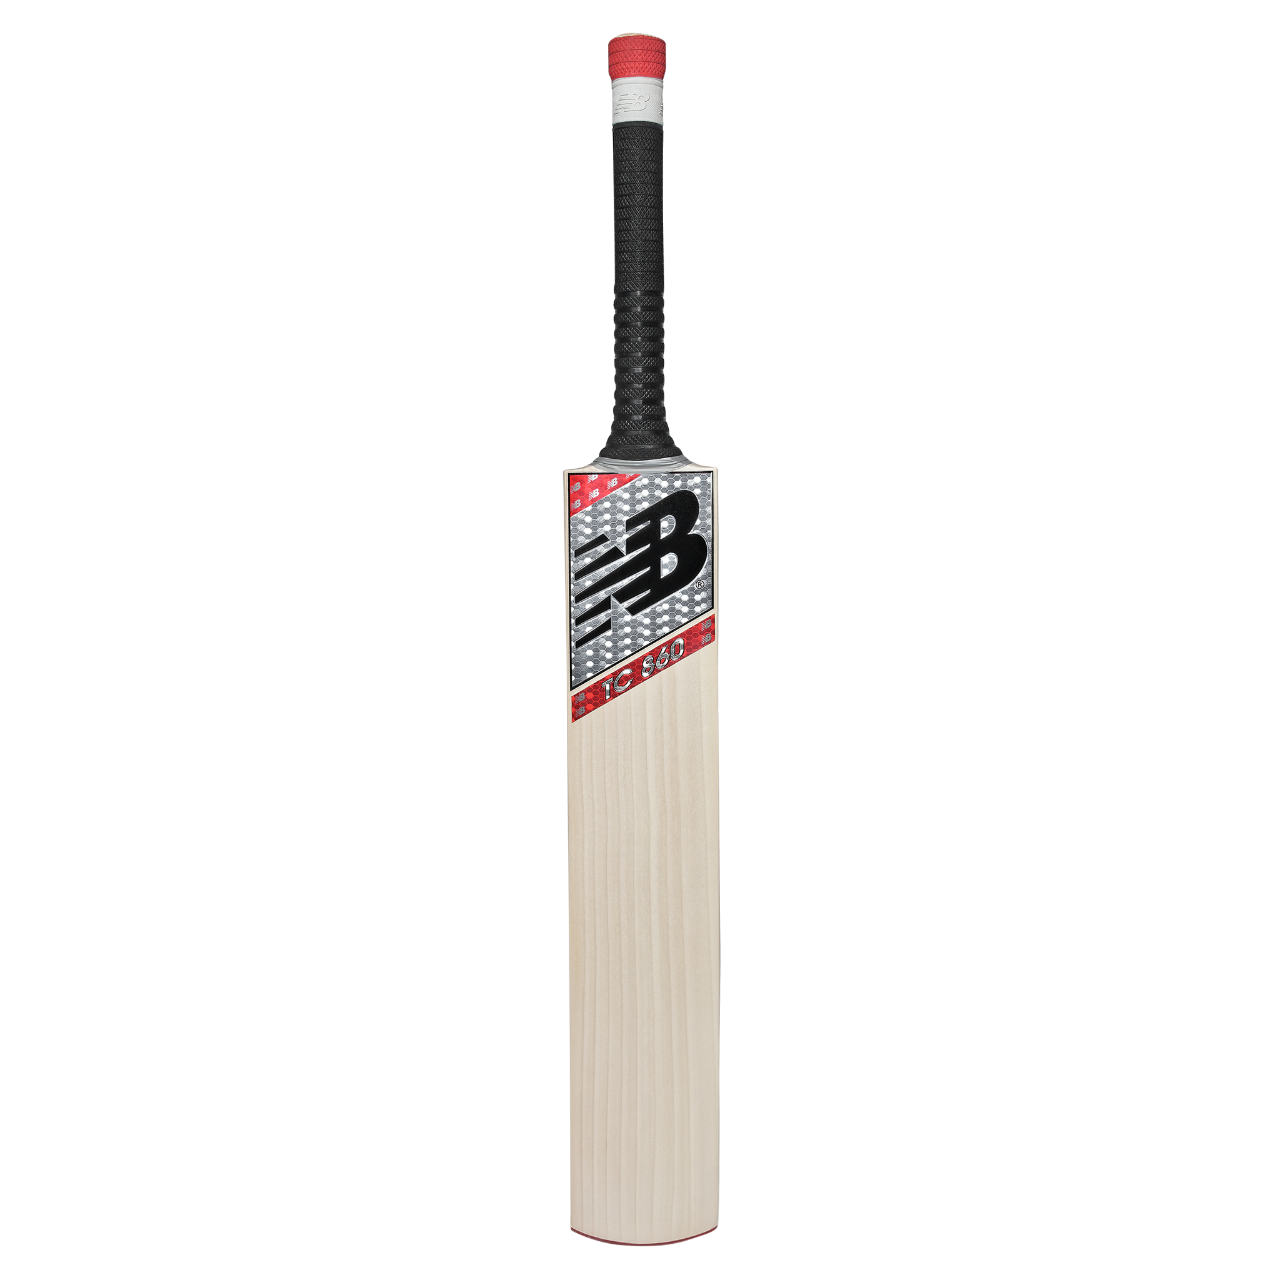 2021 New Balance TC 560 Cricket Bat